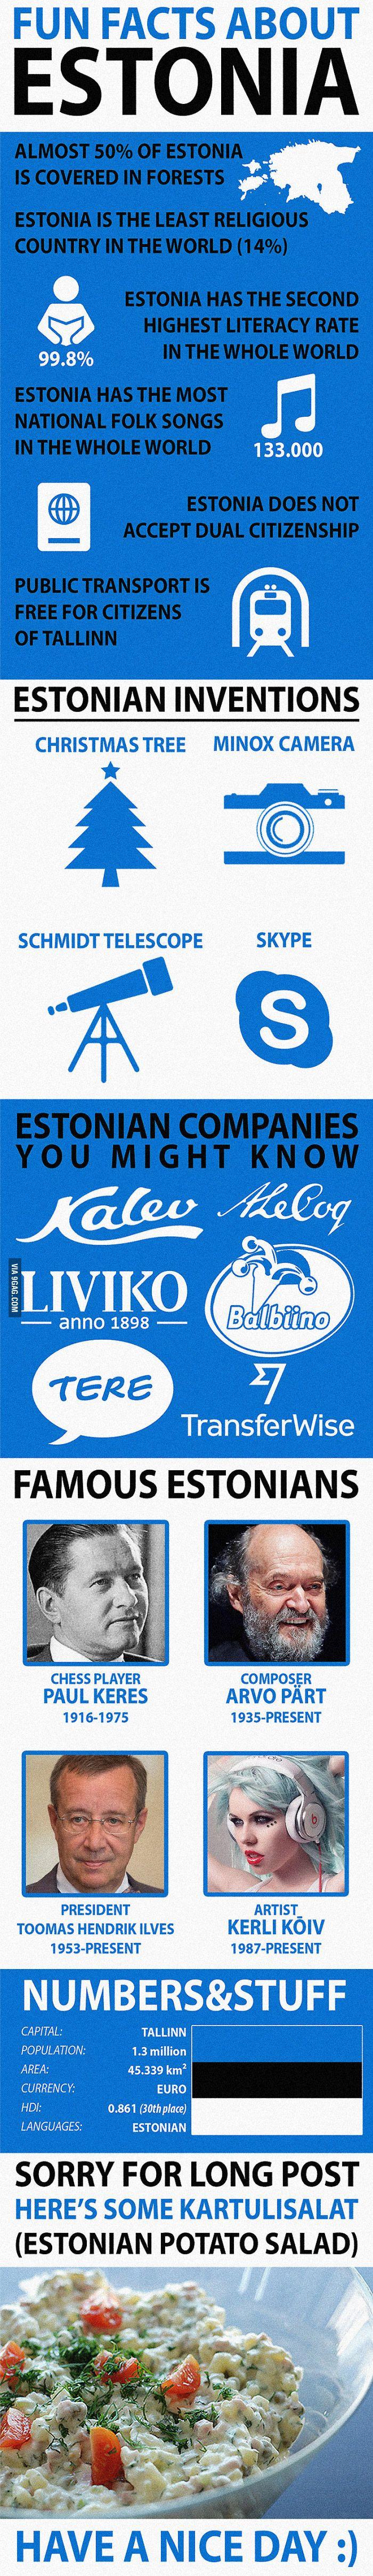 Fun Facts about Estonia